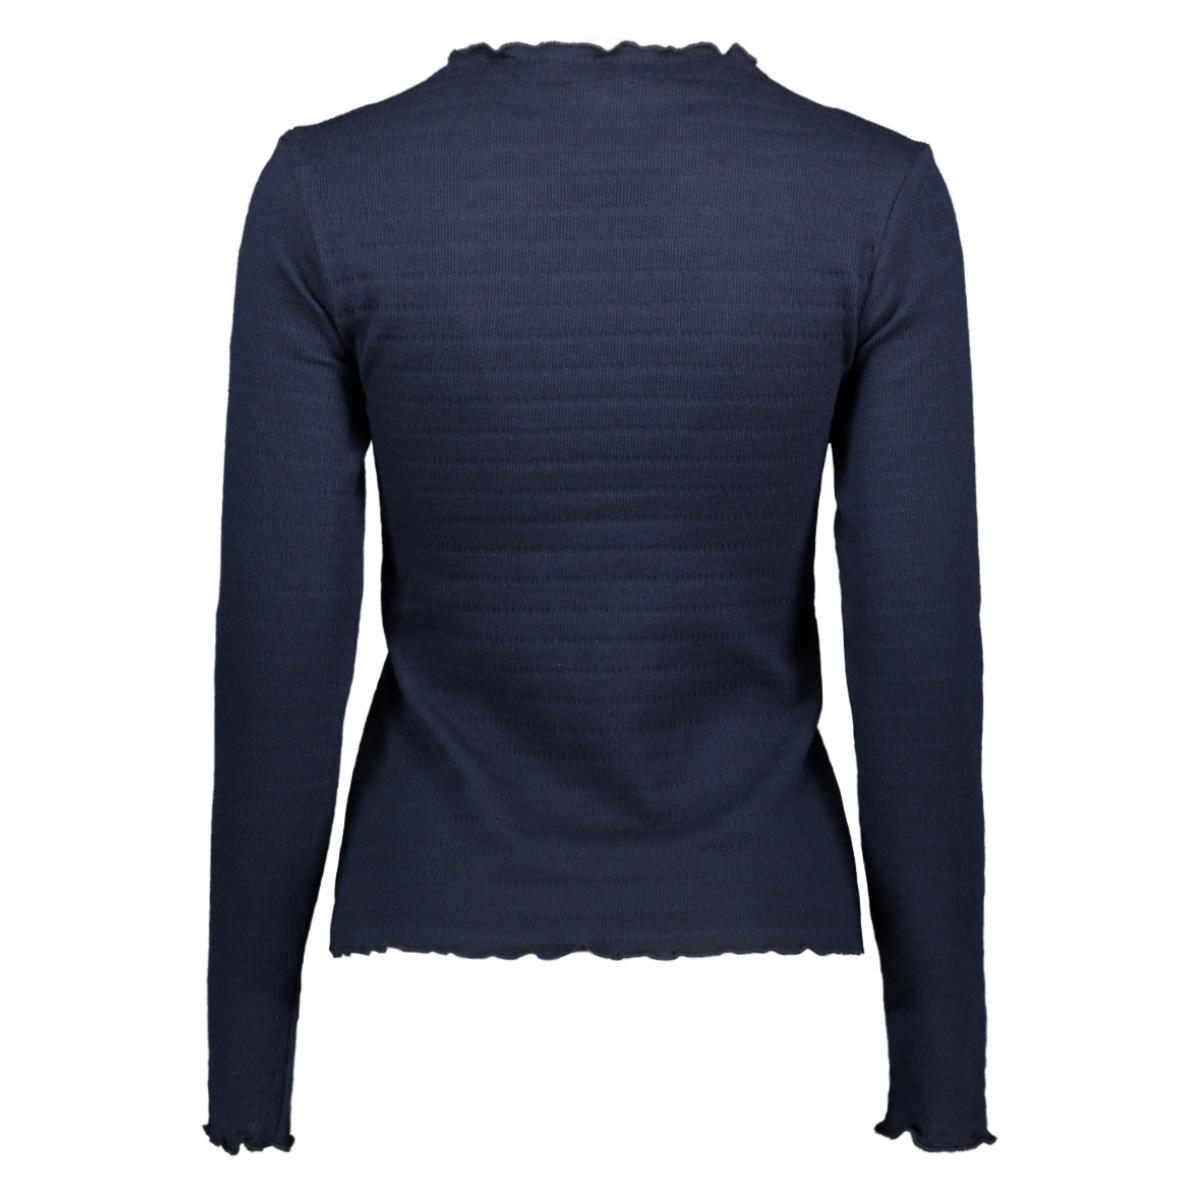 longsleeve tshirt j90206 garcia t-shirt 292 dark moon